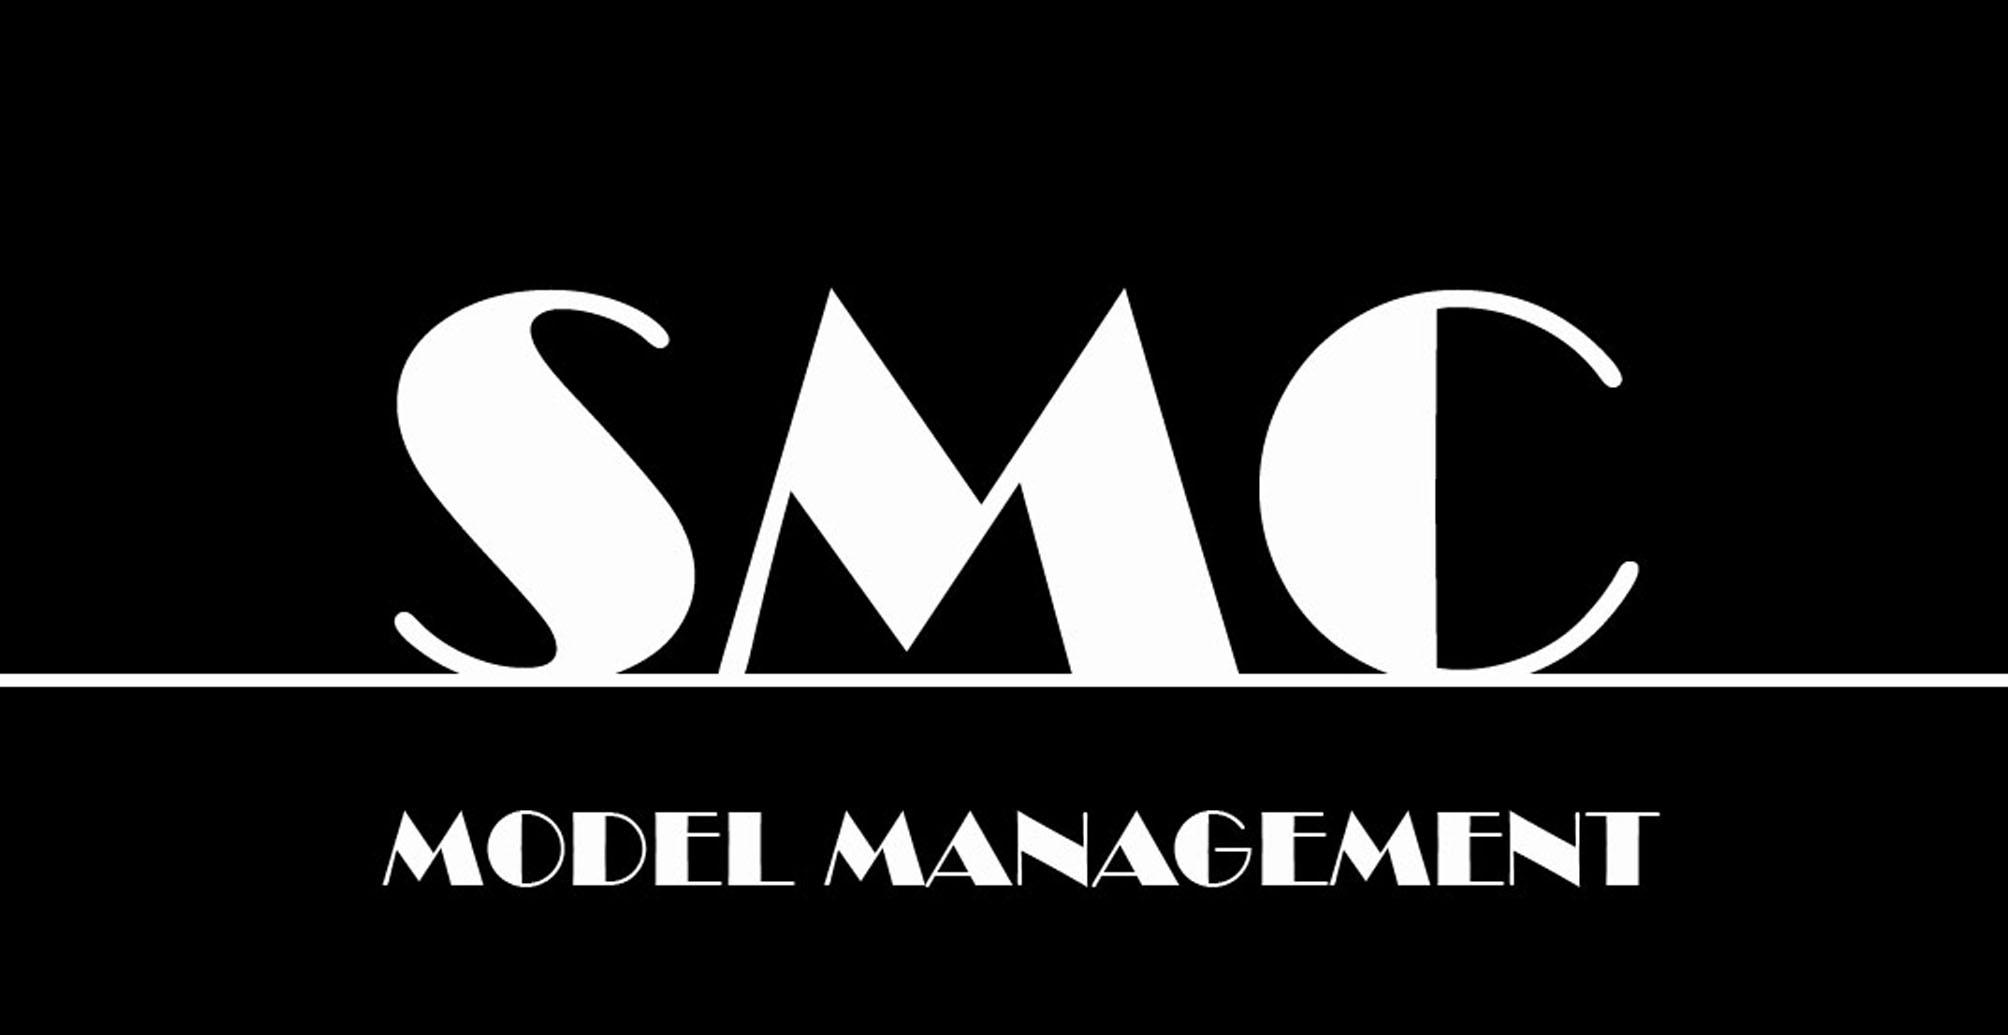 smc logo 1